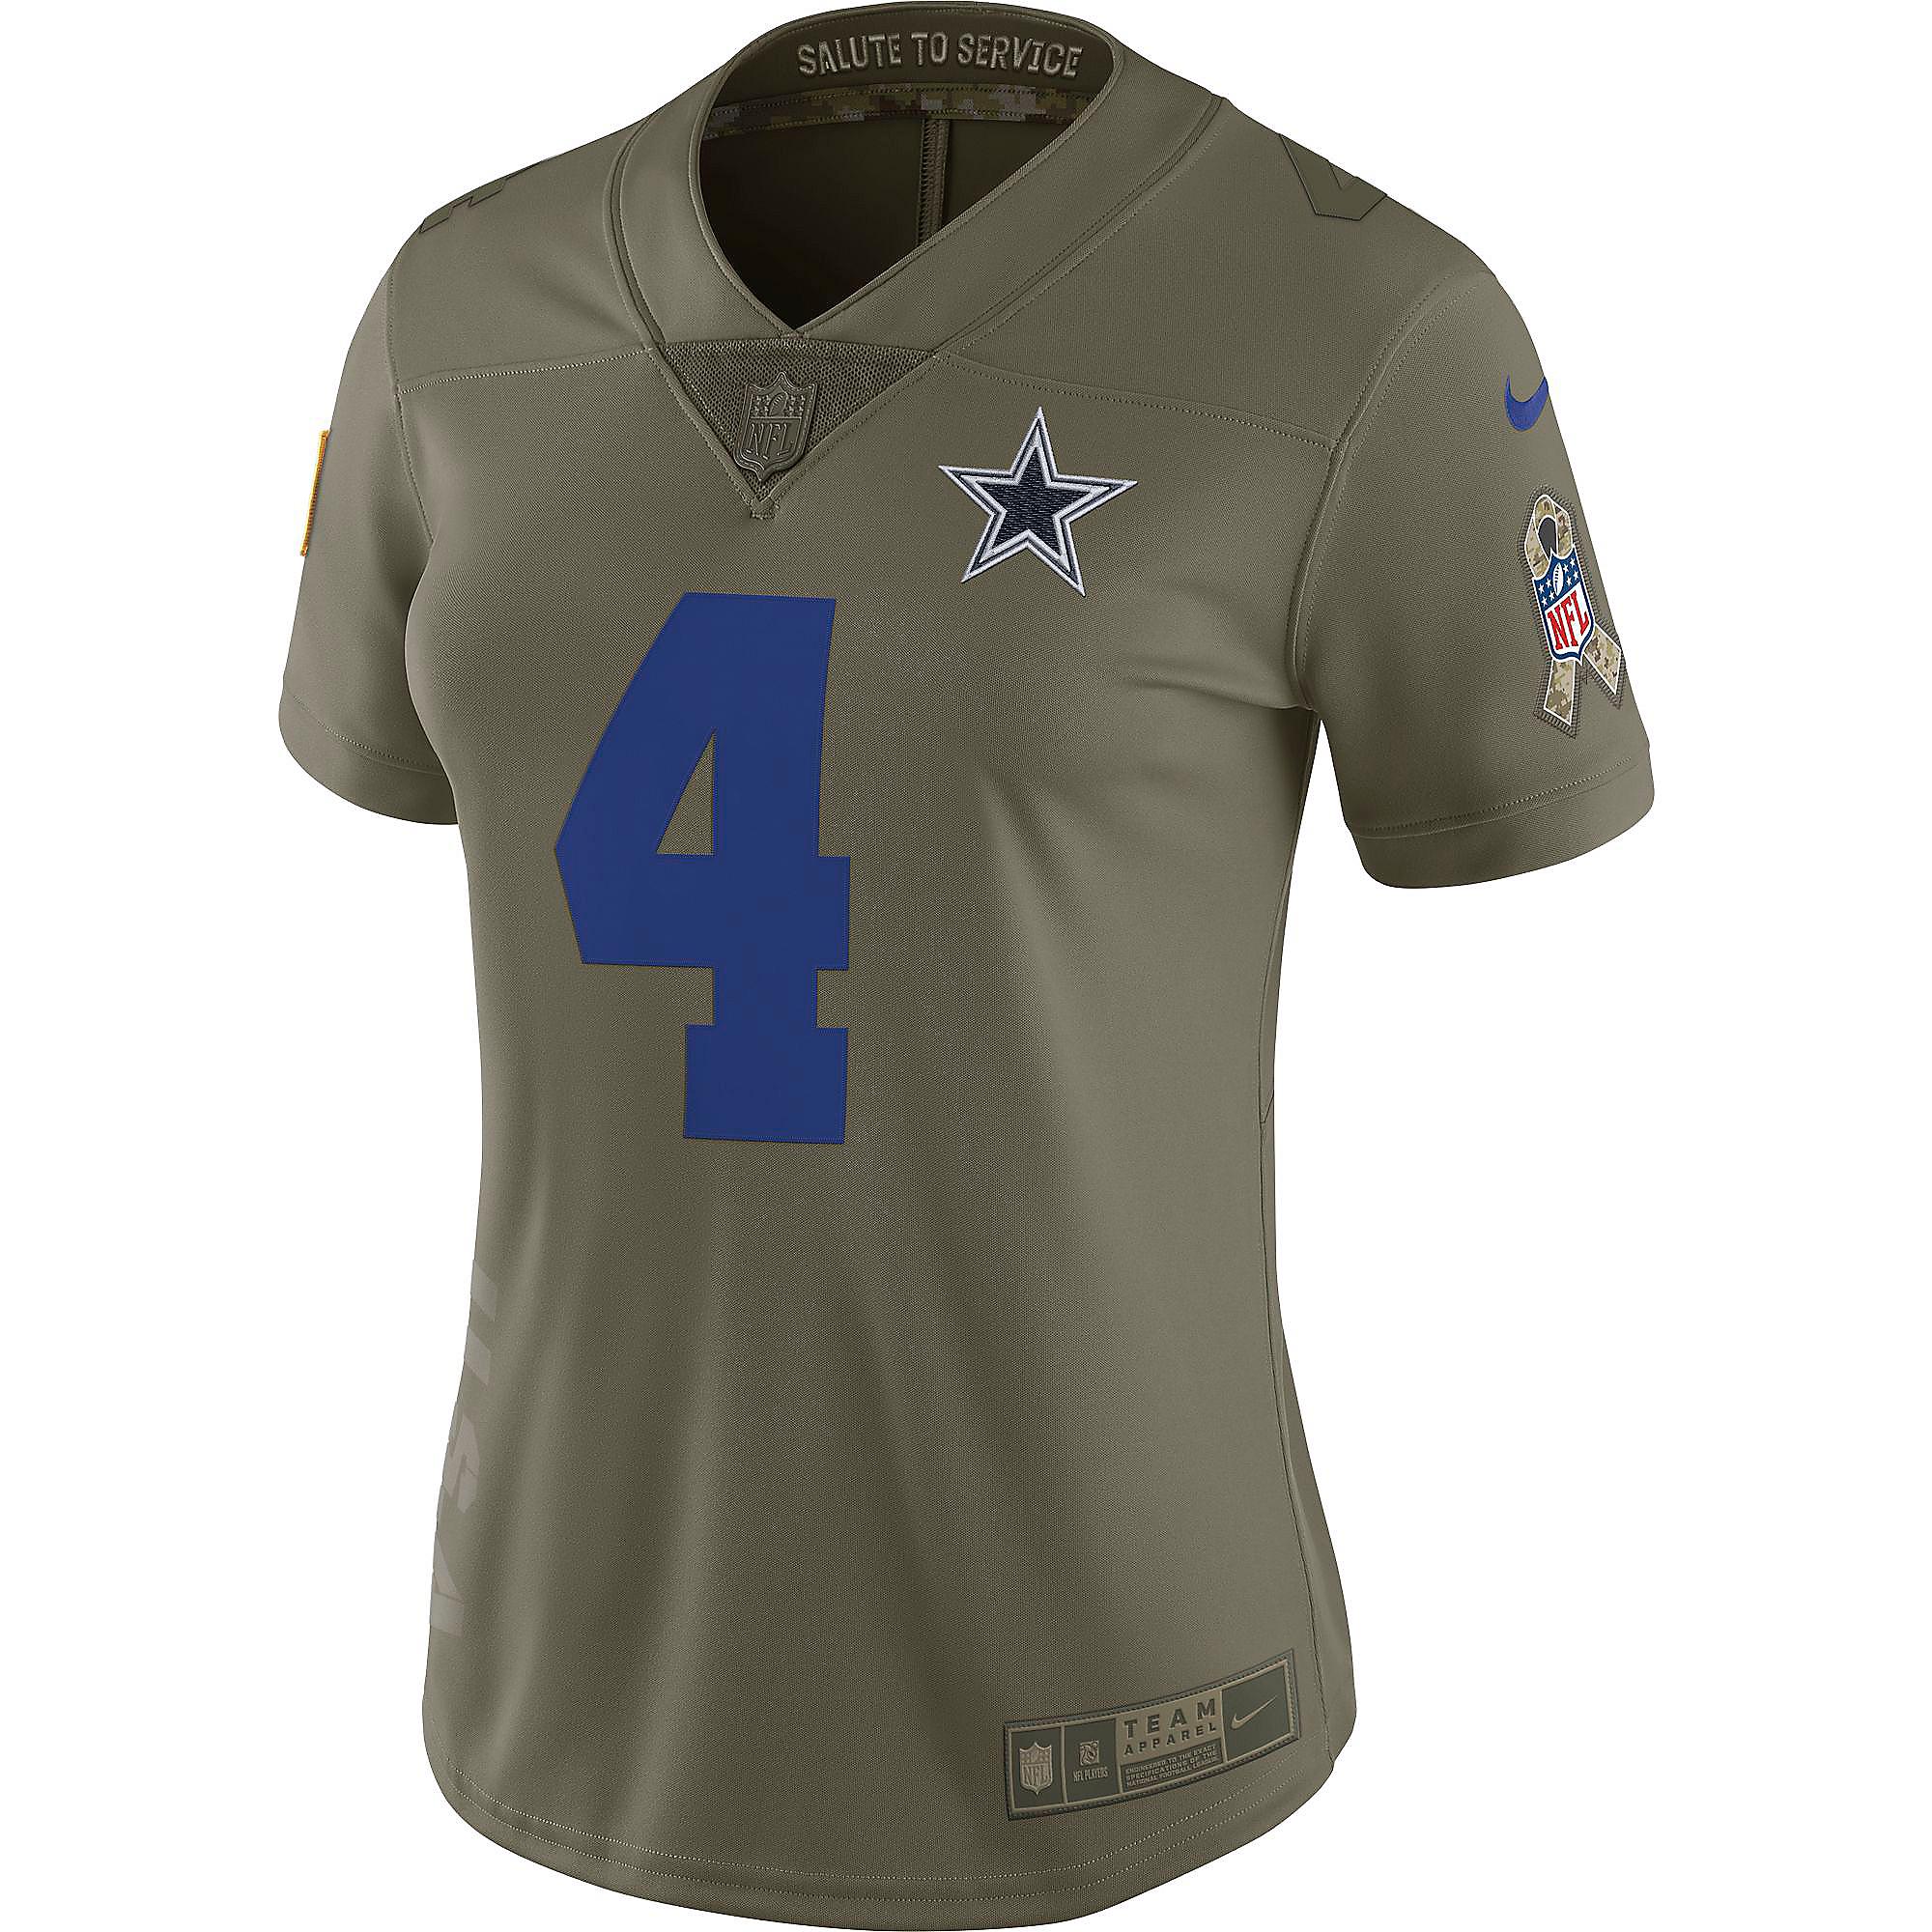 quality design 32a32 198de Dallas Cowboys Womens Dak Prescott #4 Nike Limited Salute To Service Jersey  | Dallas Cowboys Pro Shop